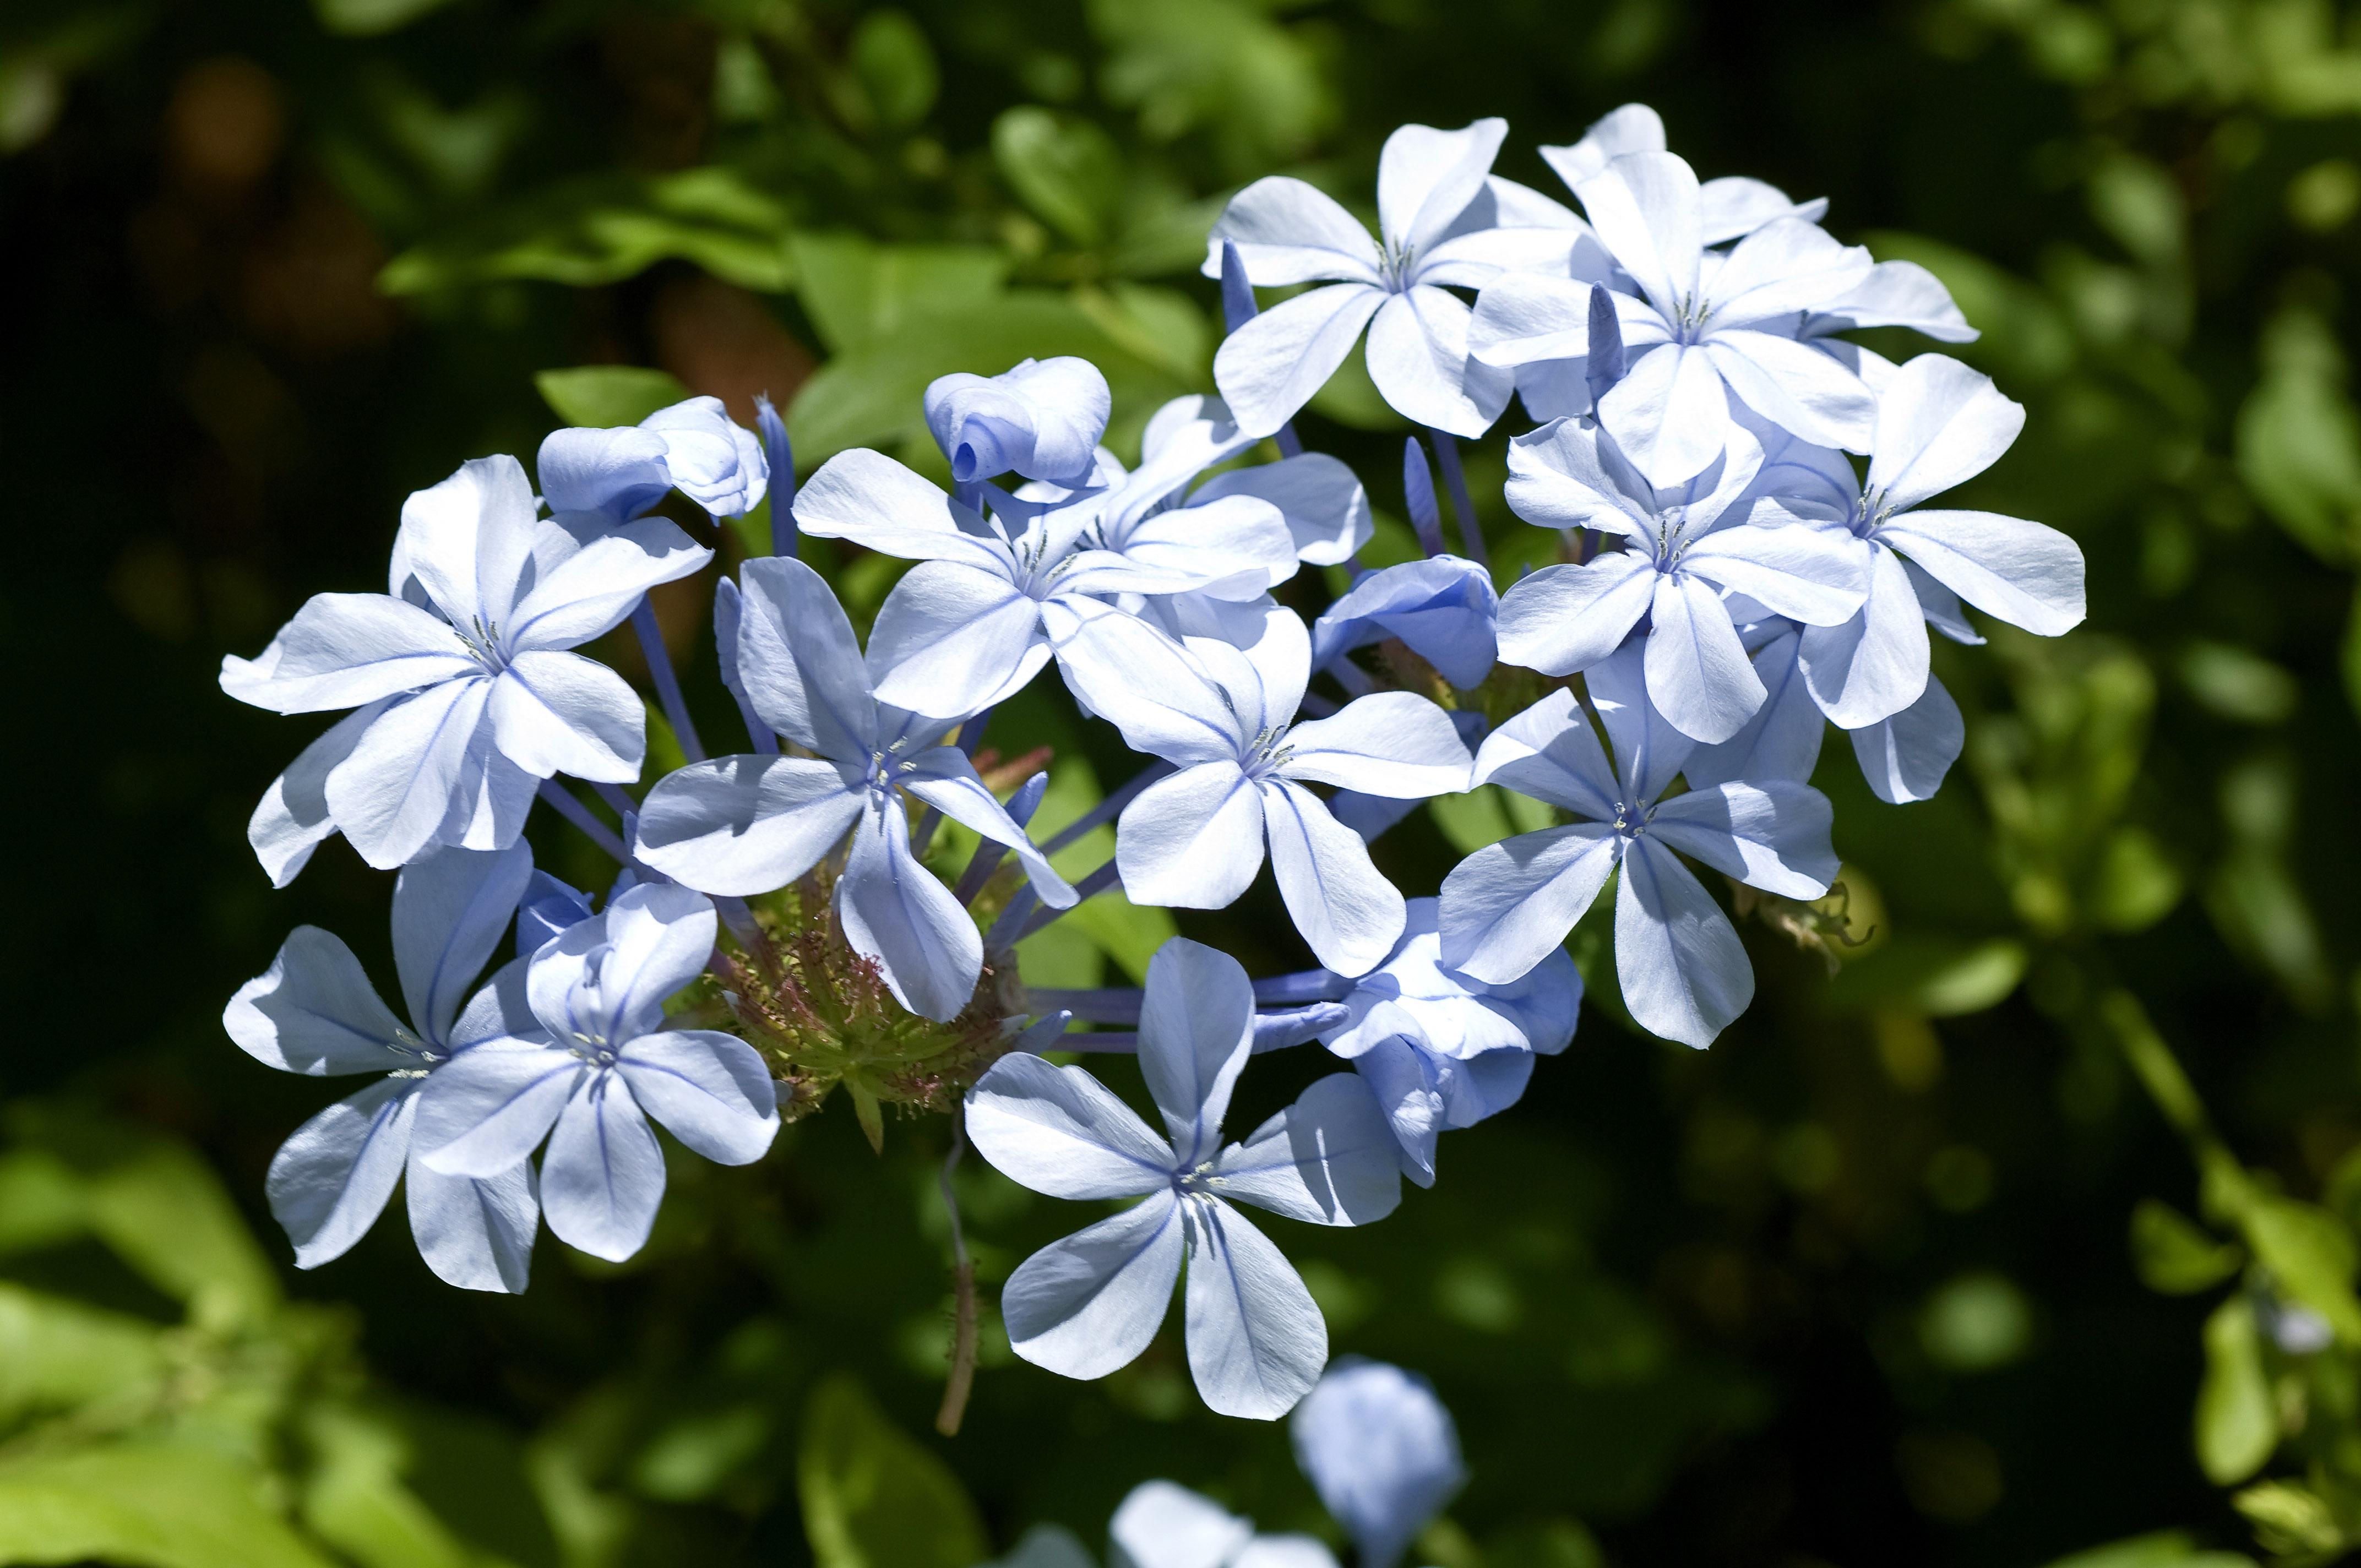 Don burke archives page 7 of 13 burke 39 s backyard for Blue flowering bush